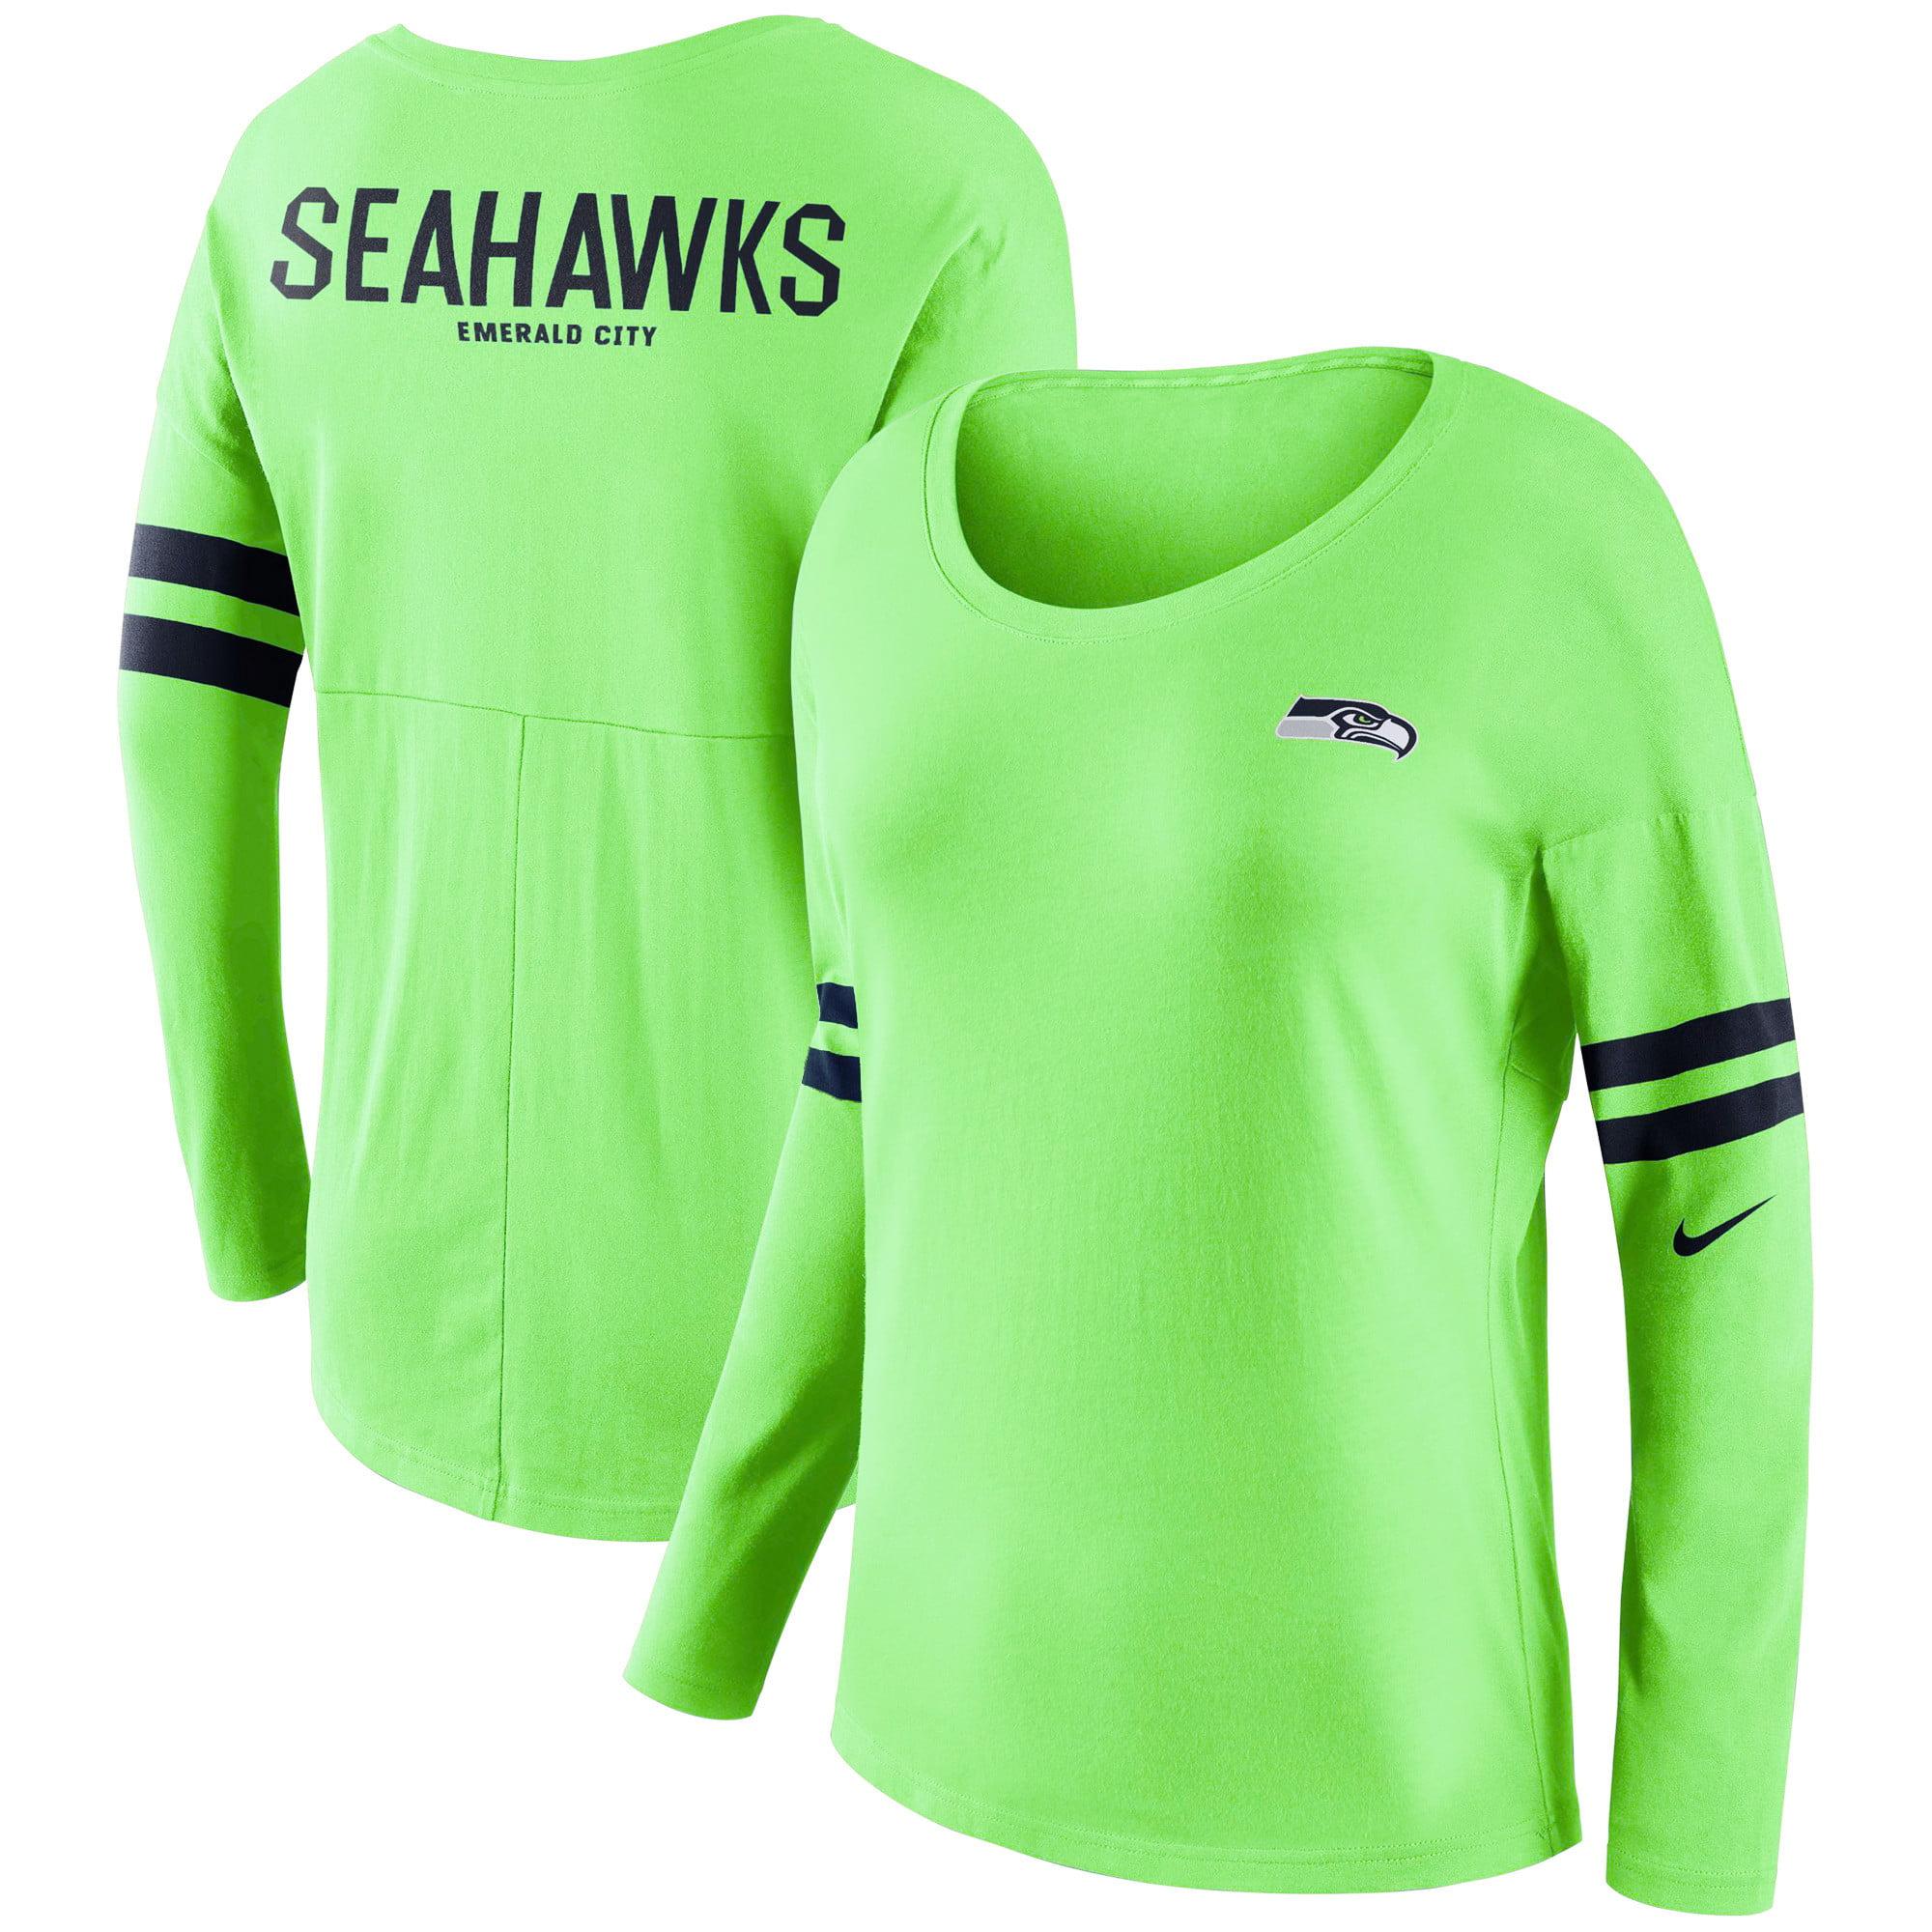 seahawks green long sleeve shirt